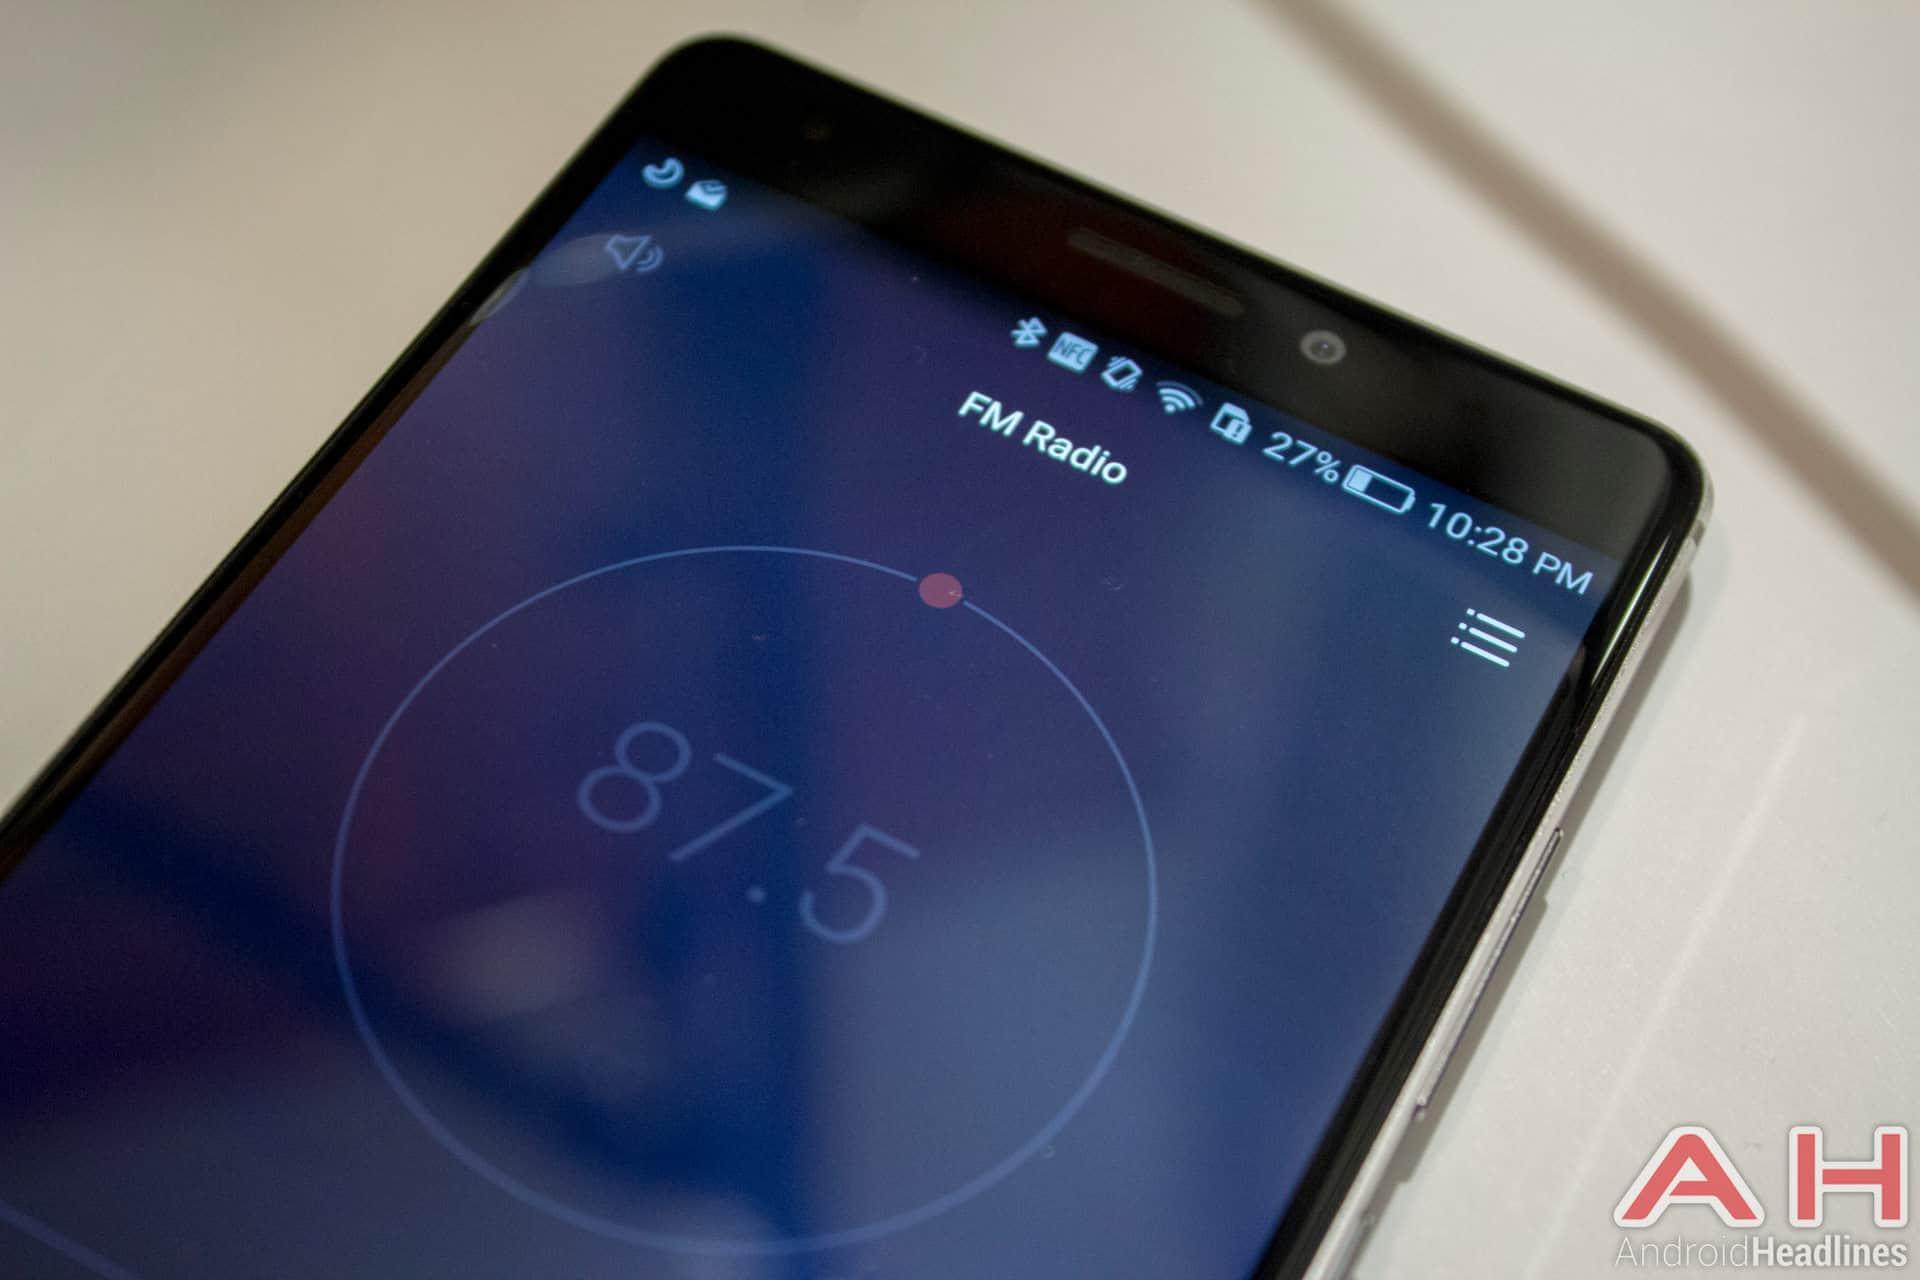 Huawei-Mate-S-AH-NS-audio